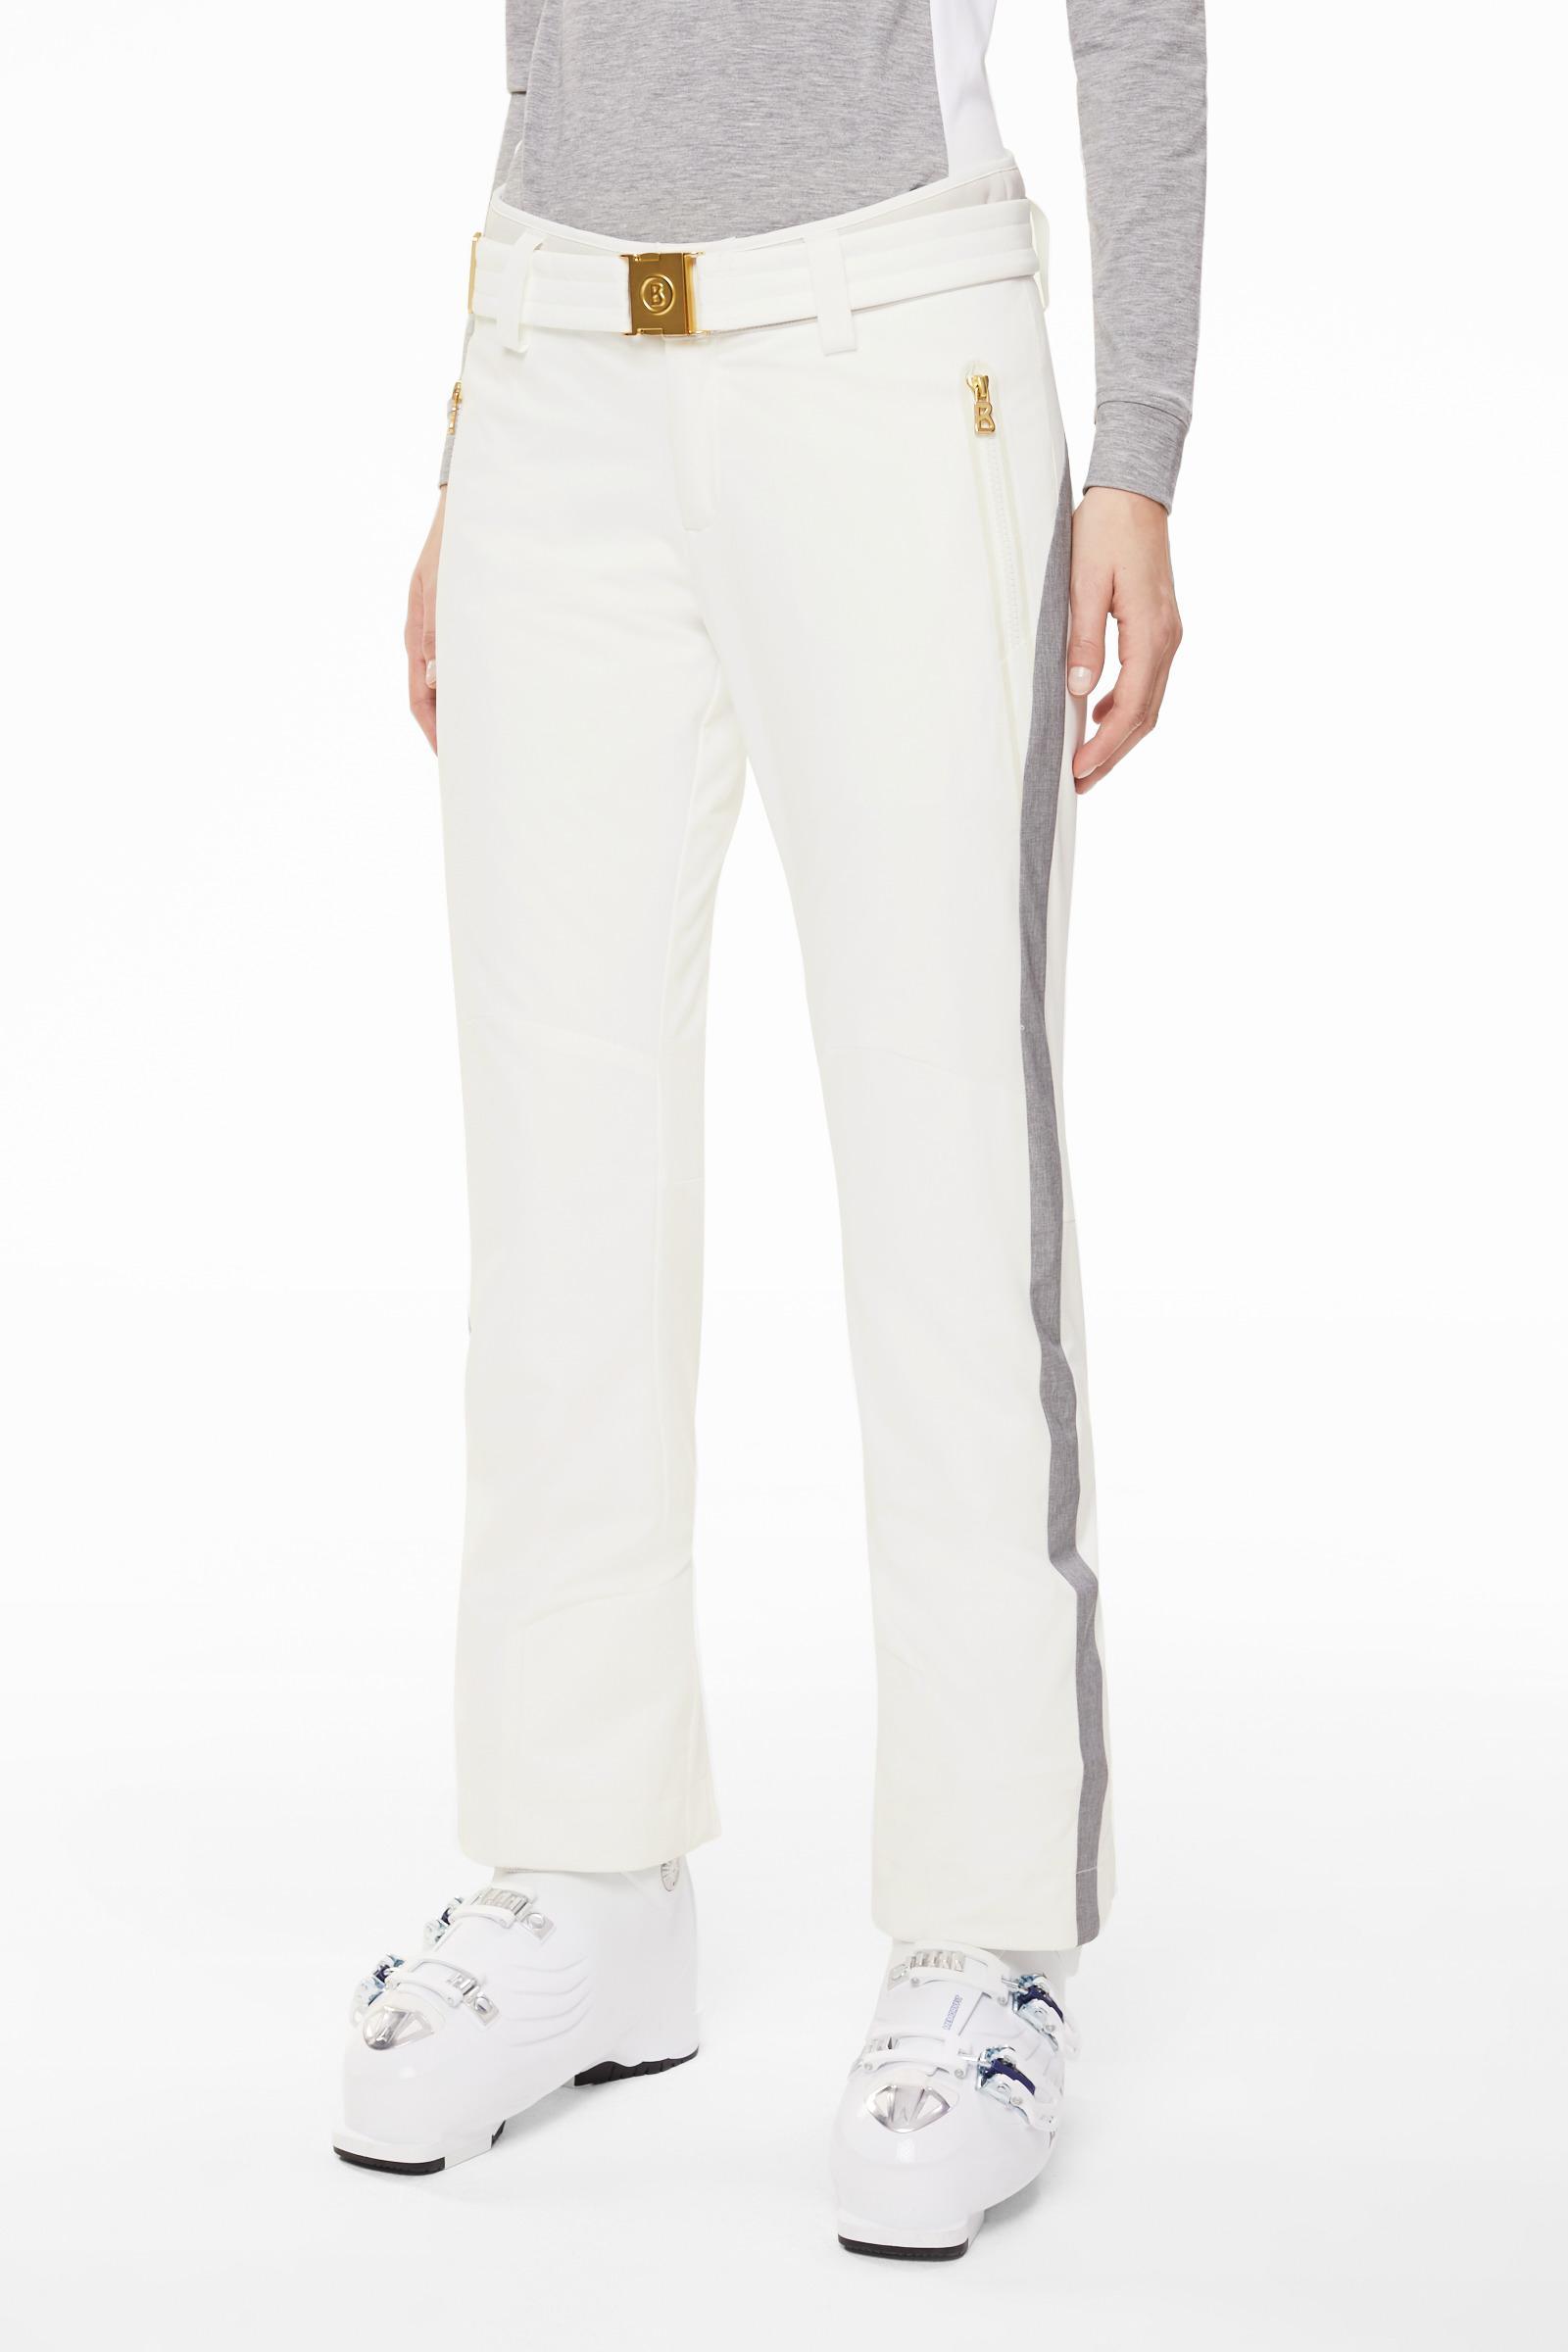 5395d8acabc9c3 Lyst - Bogner Smilla Ski Trousers In Off-white in White - Save 20%